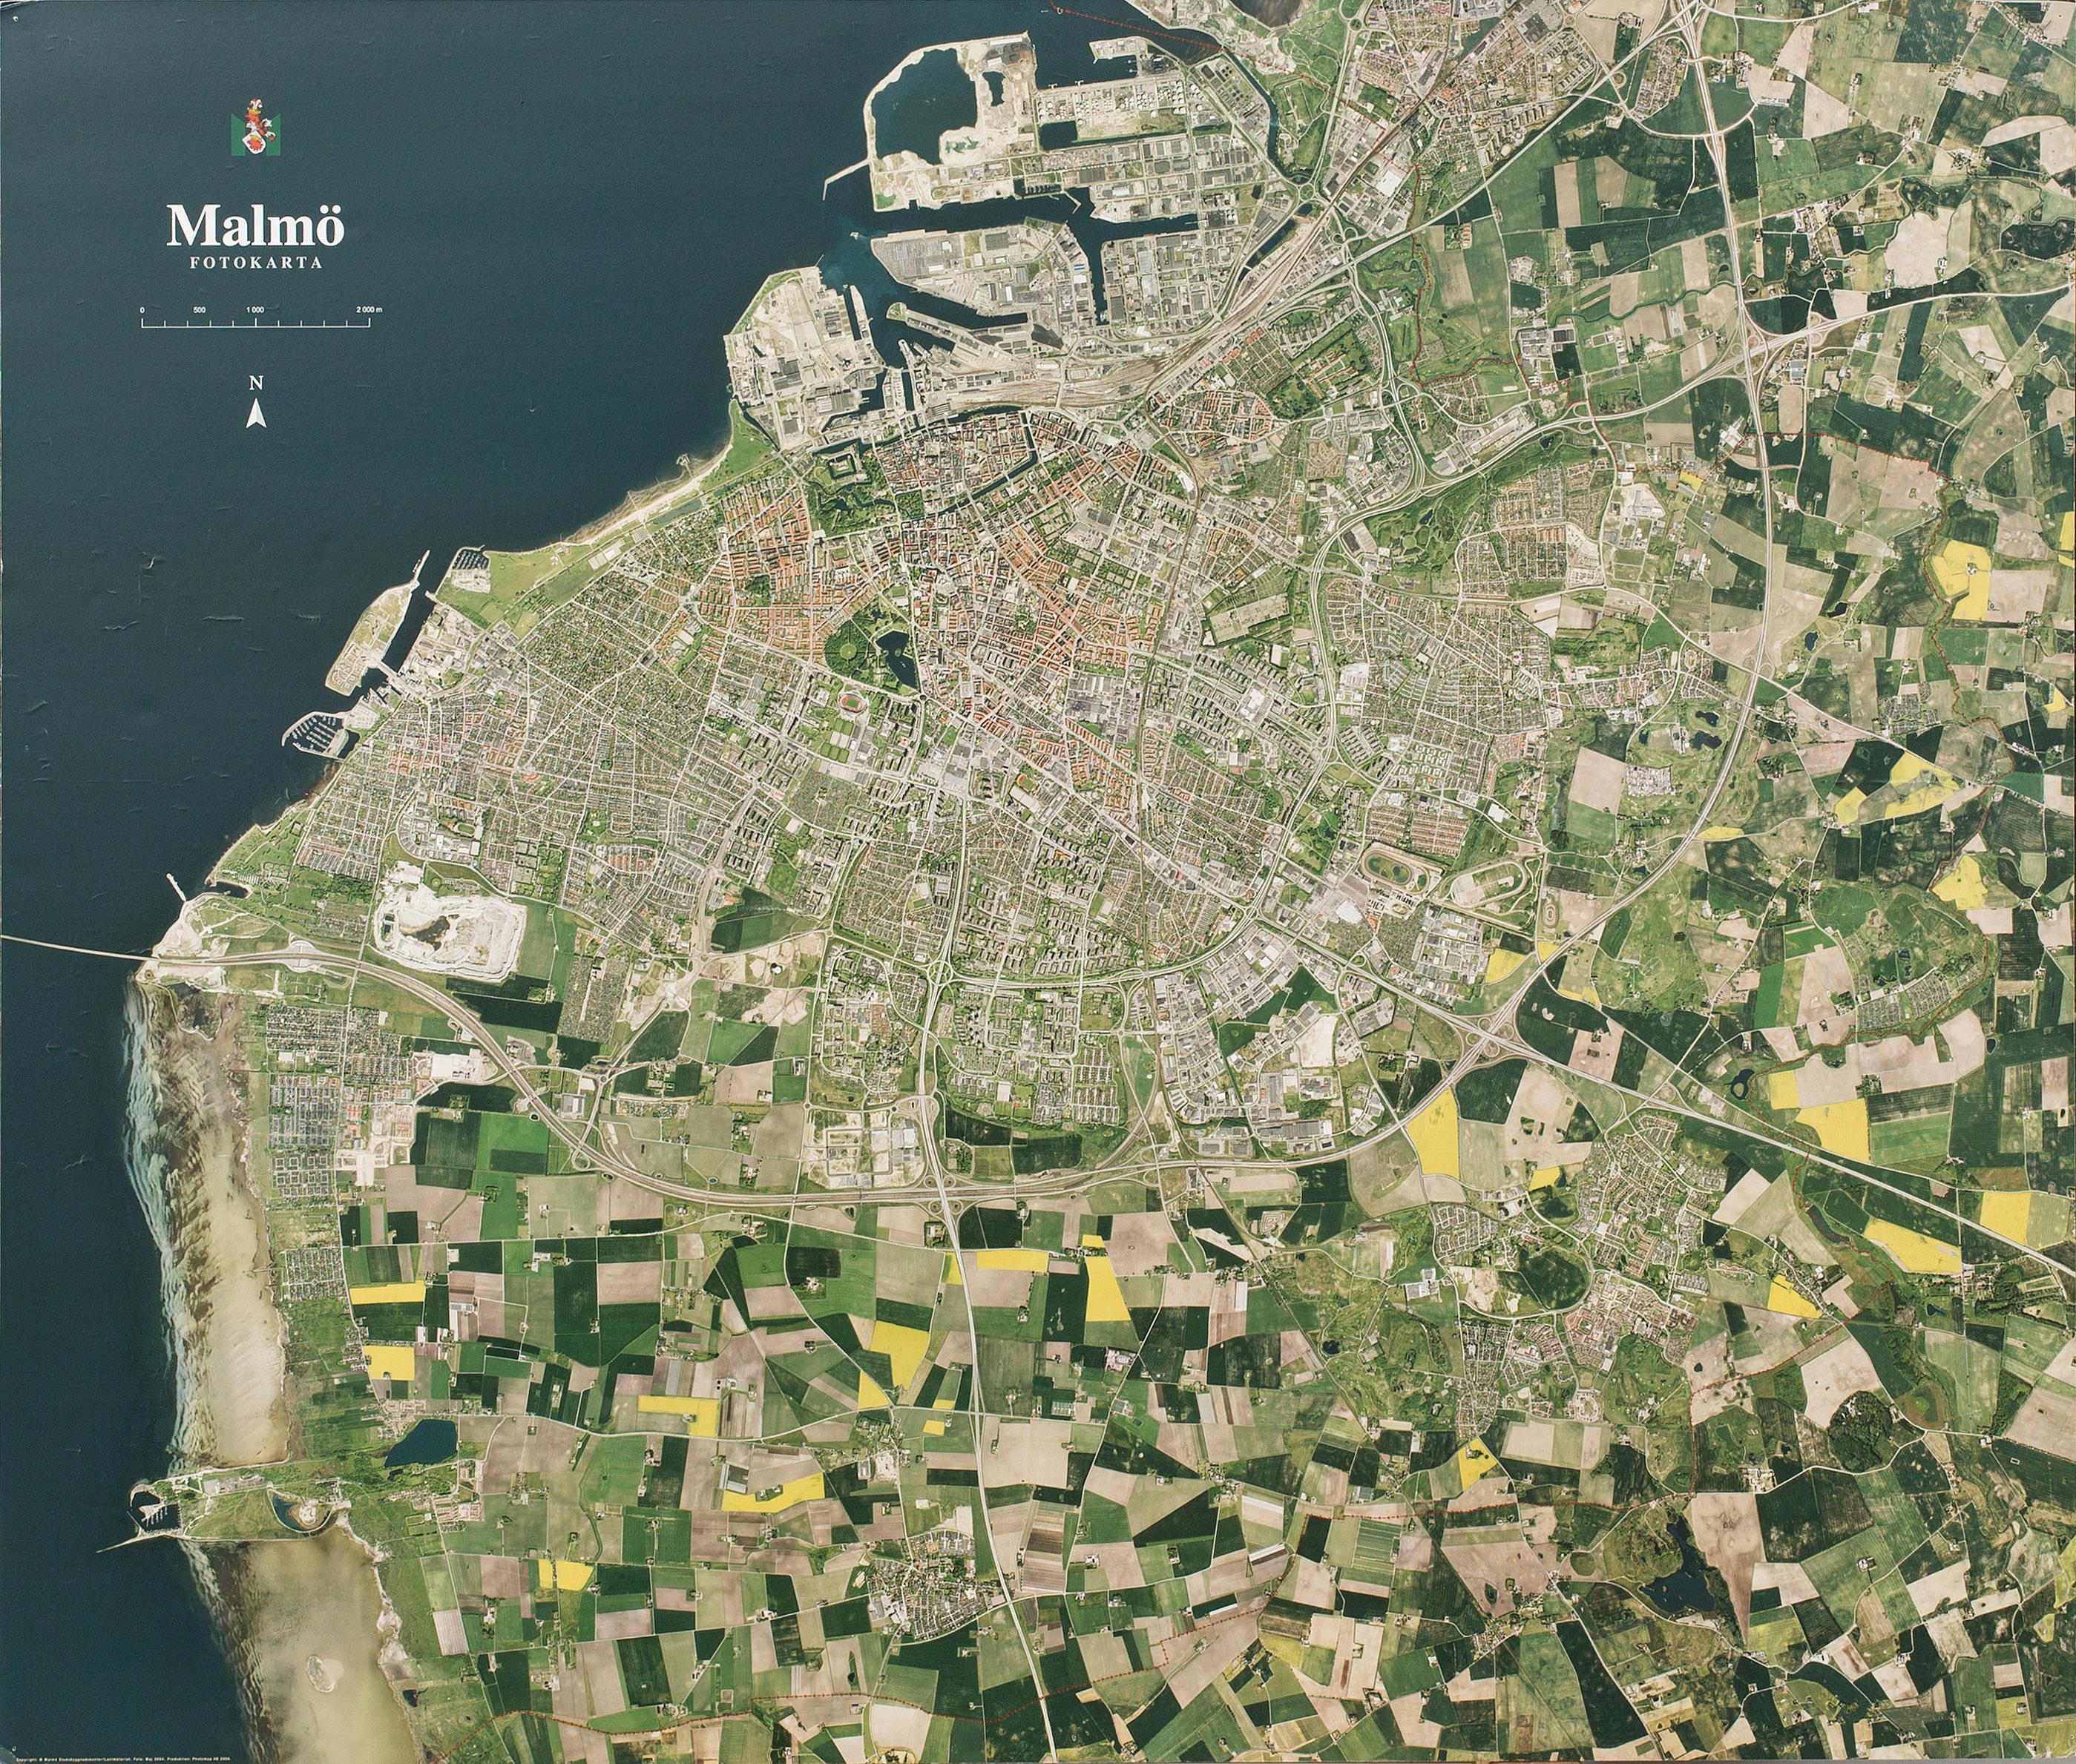 PHOTO MAP OF MALM 2004 Bukowskis